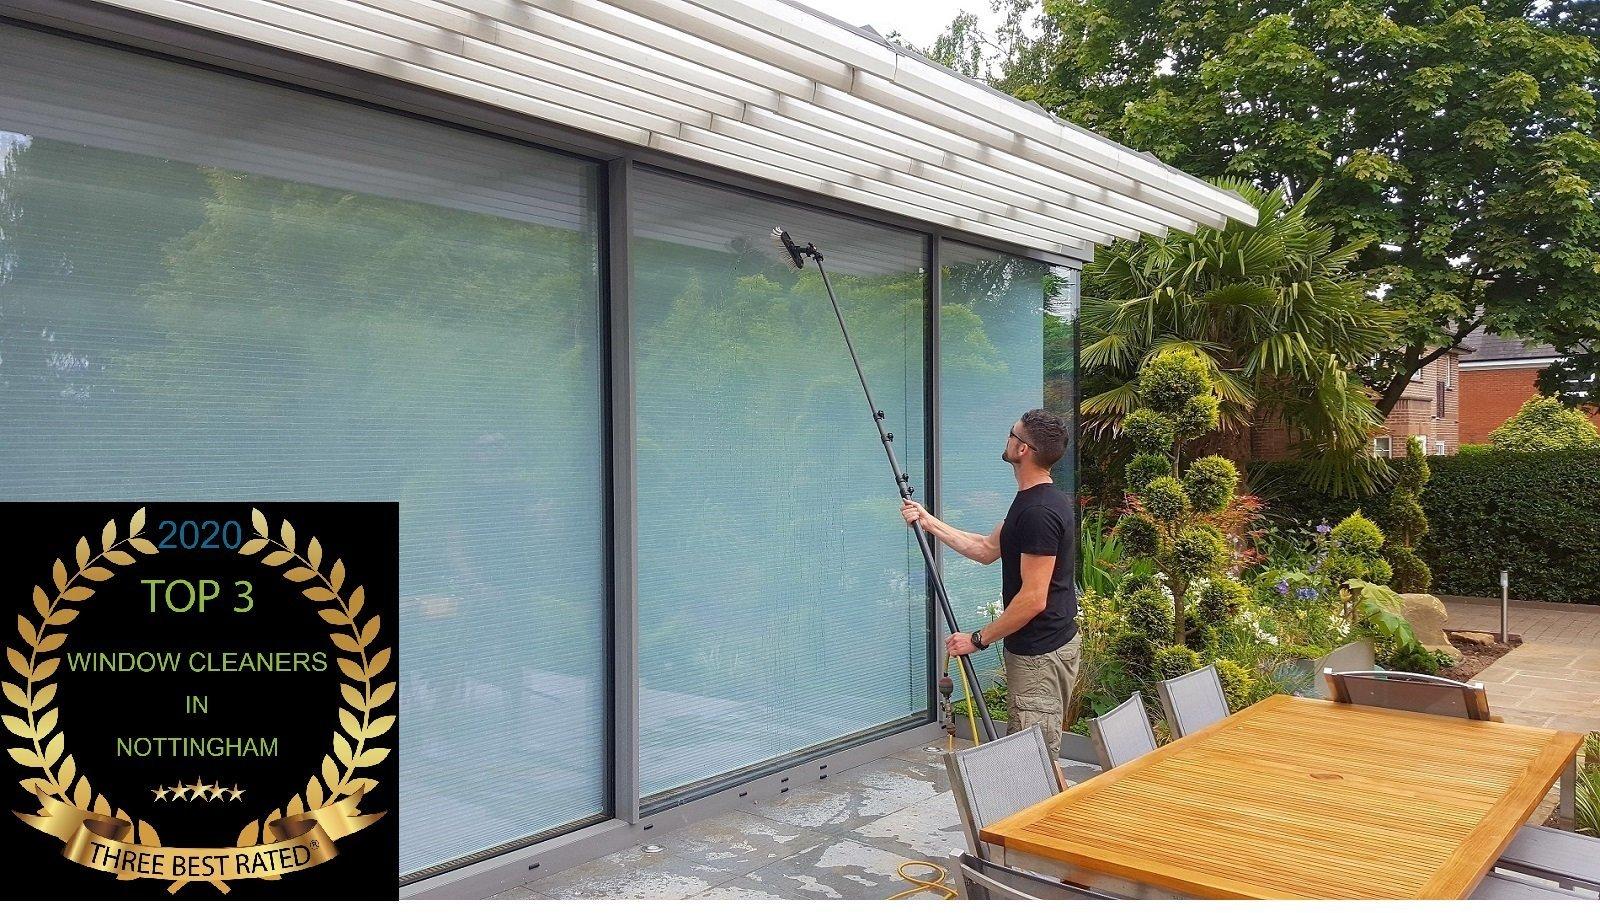 Puretech Window Cleaning